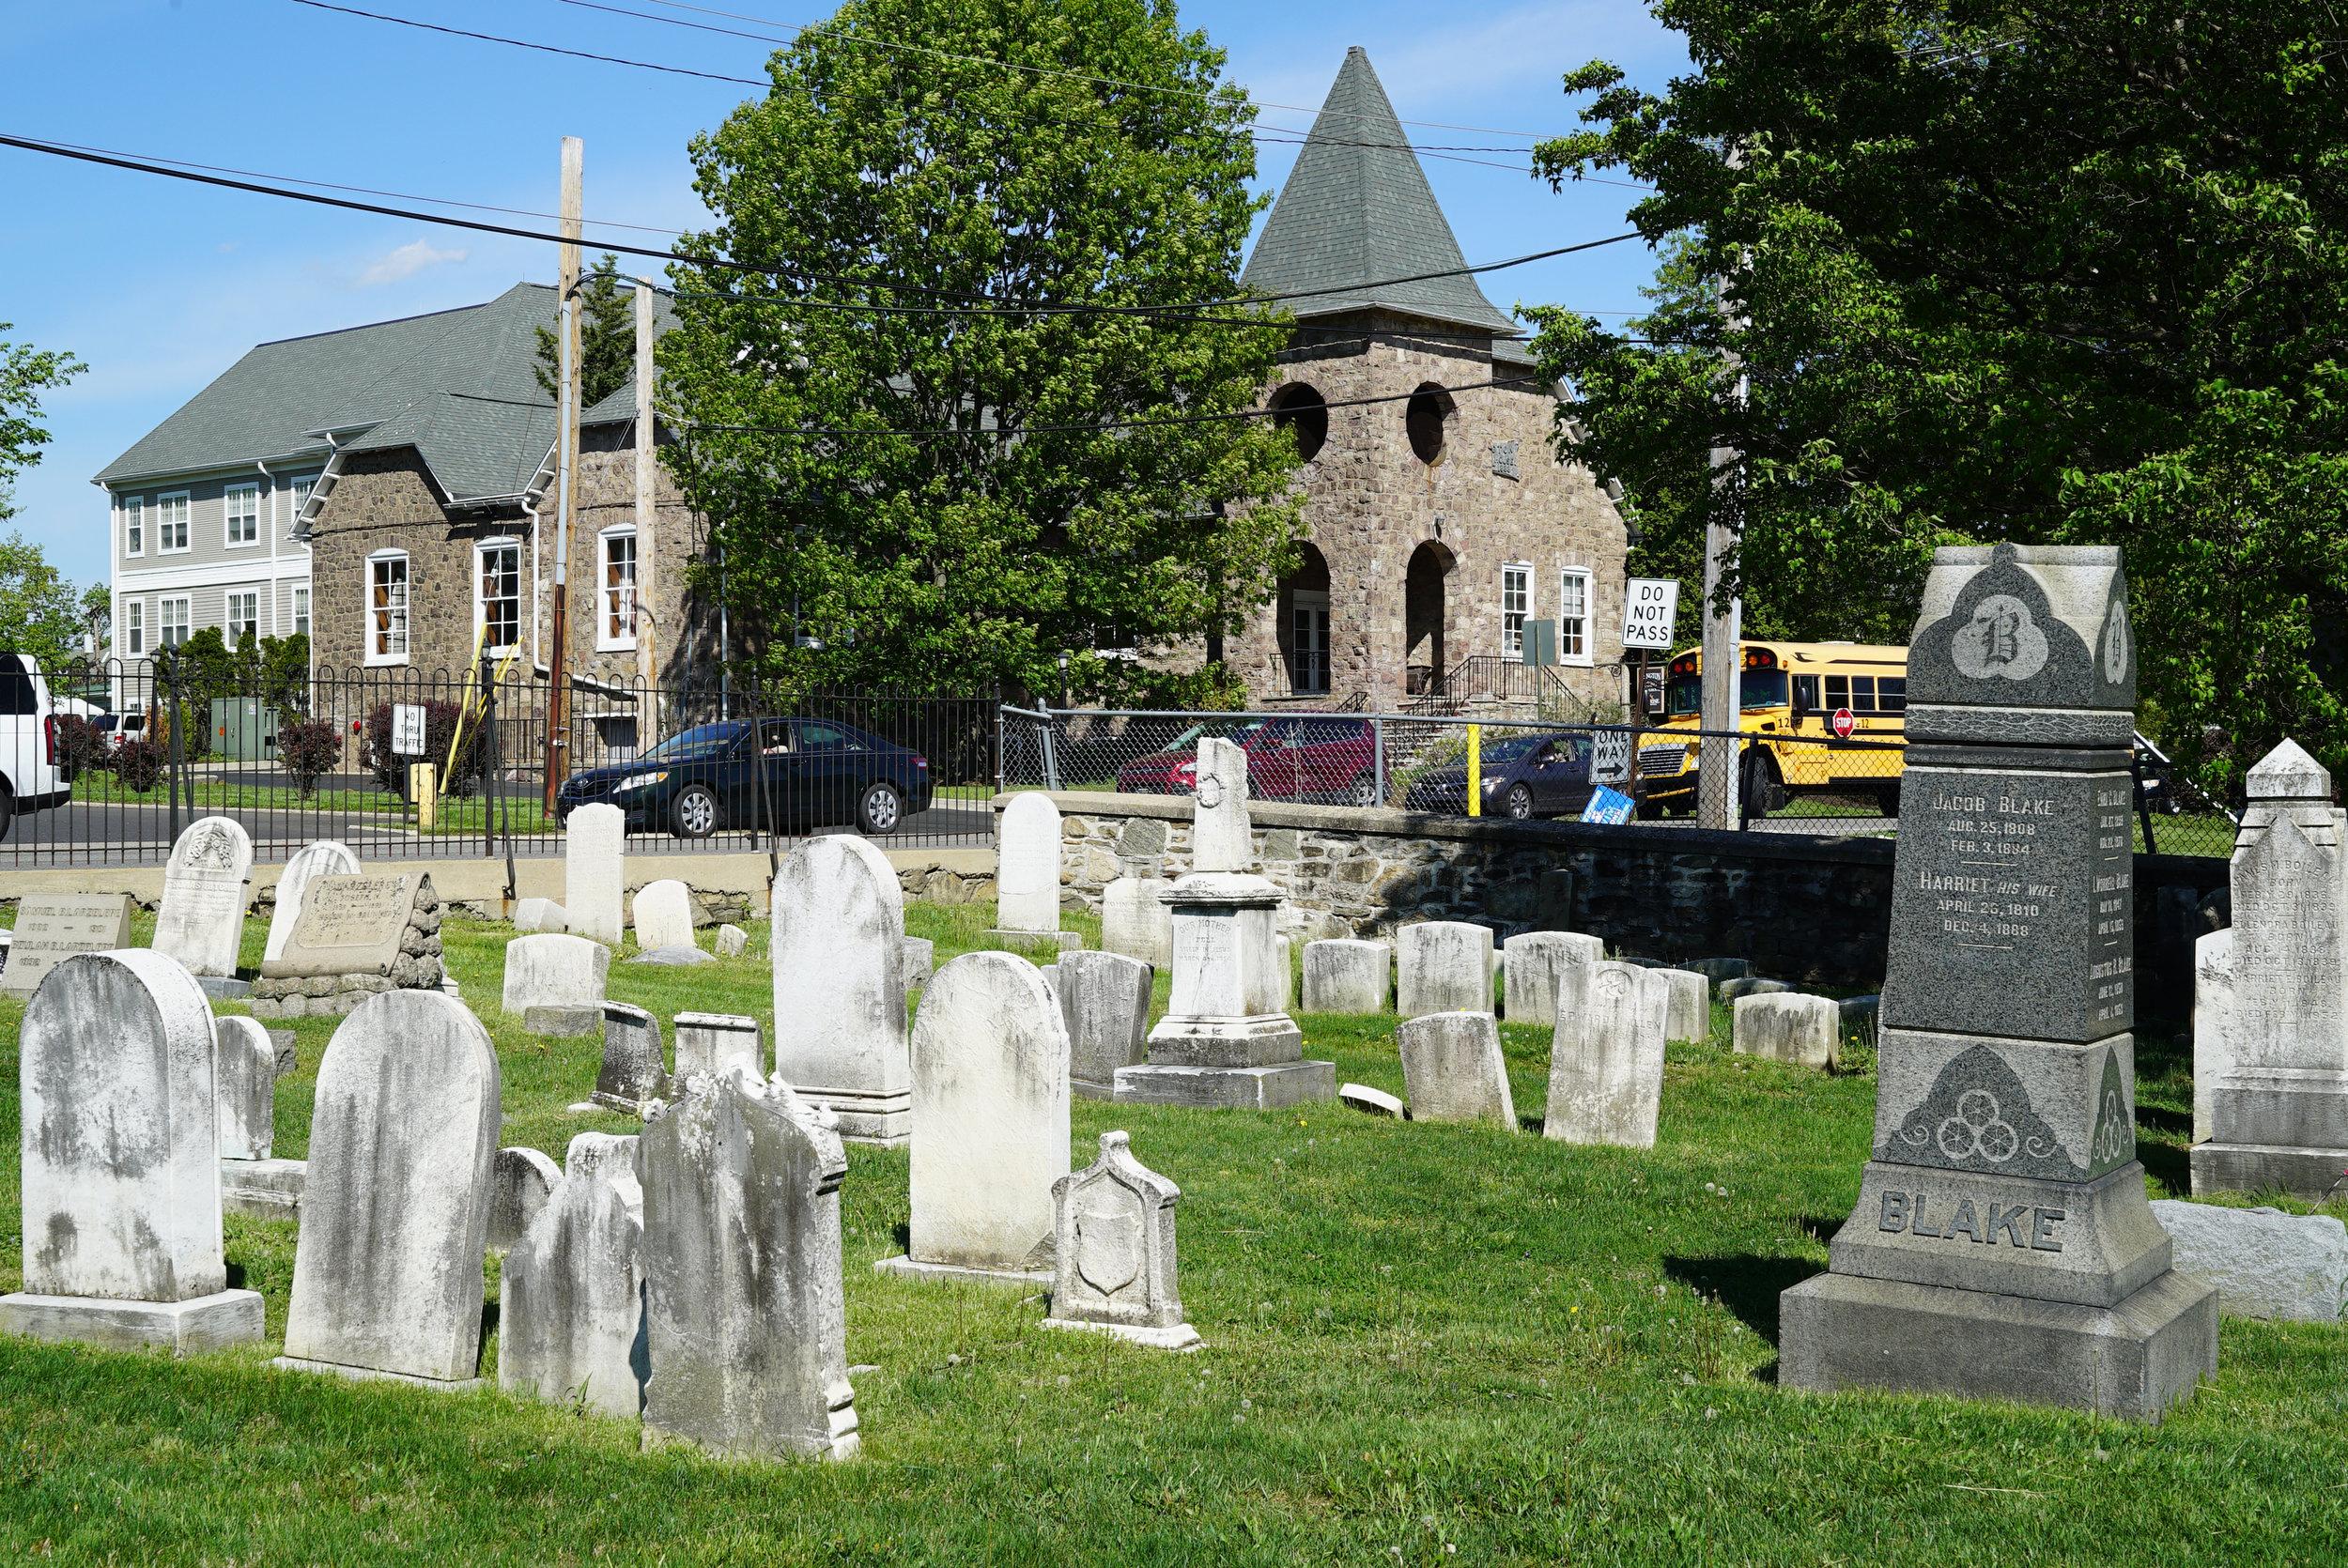 abington presbyterian church cemetery.jpg